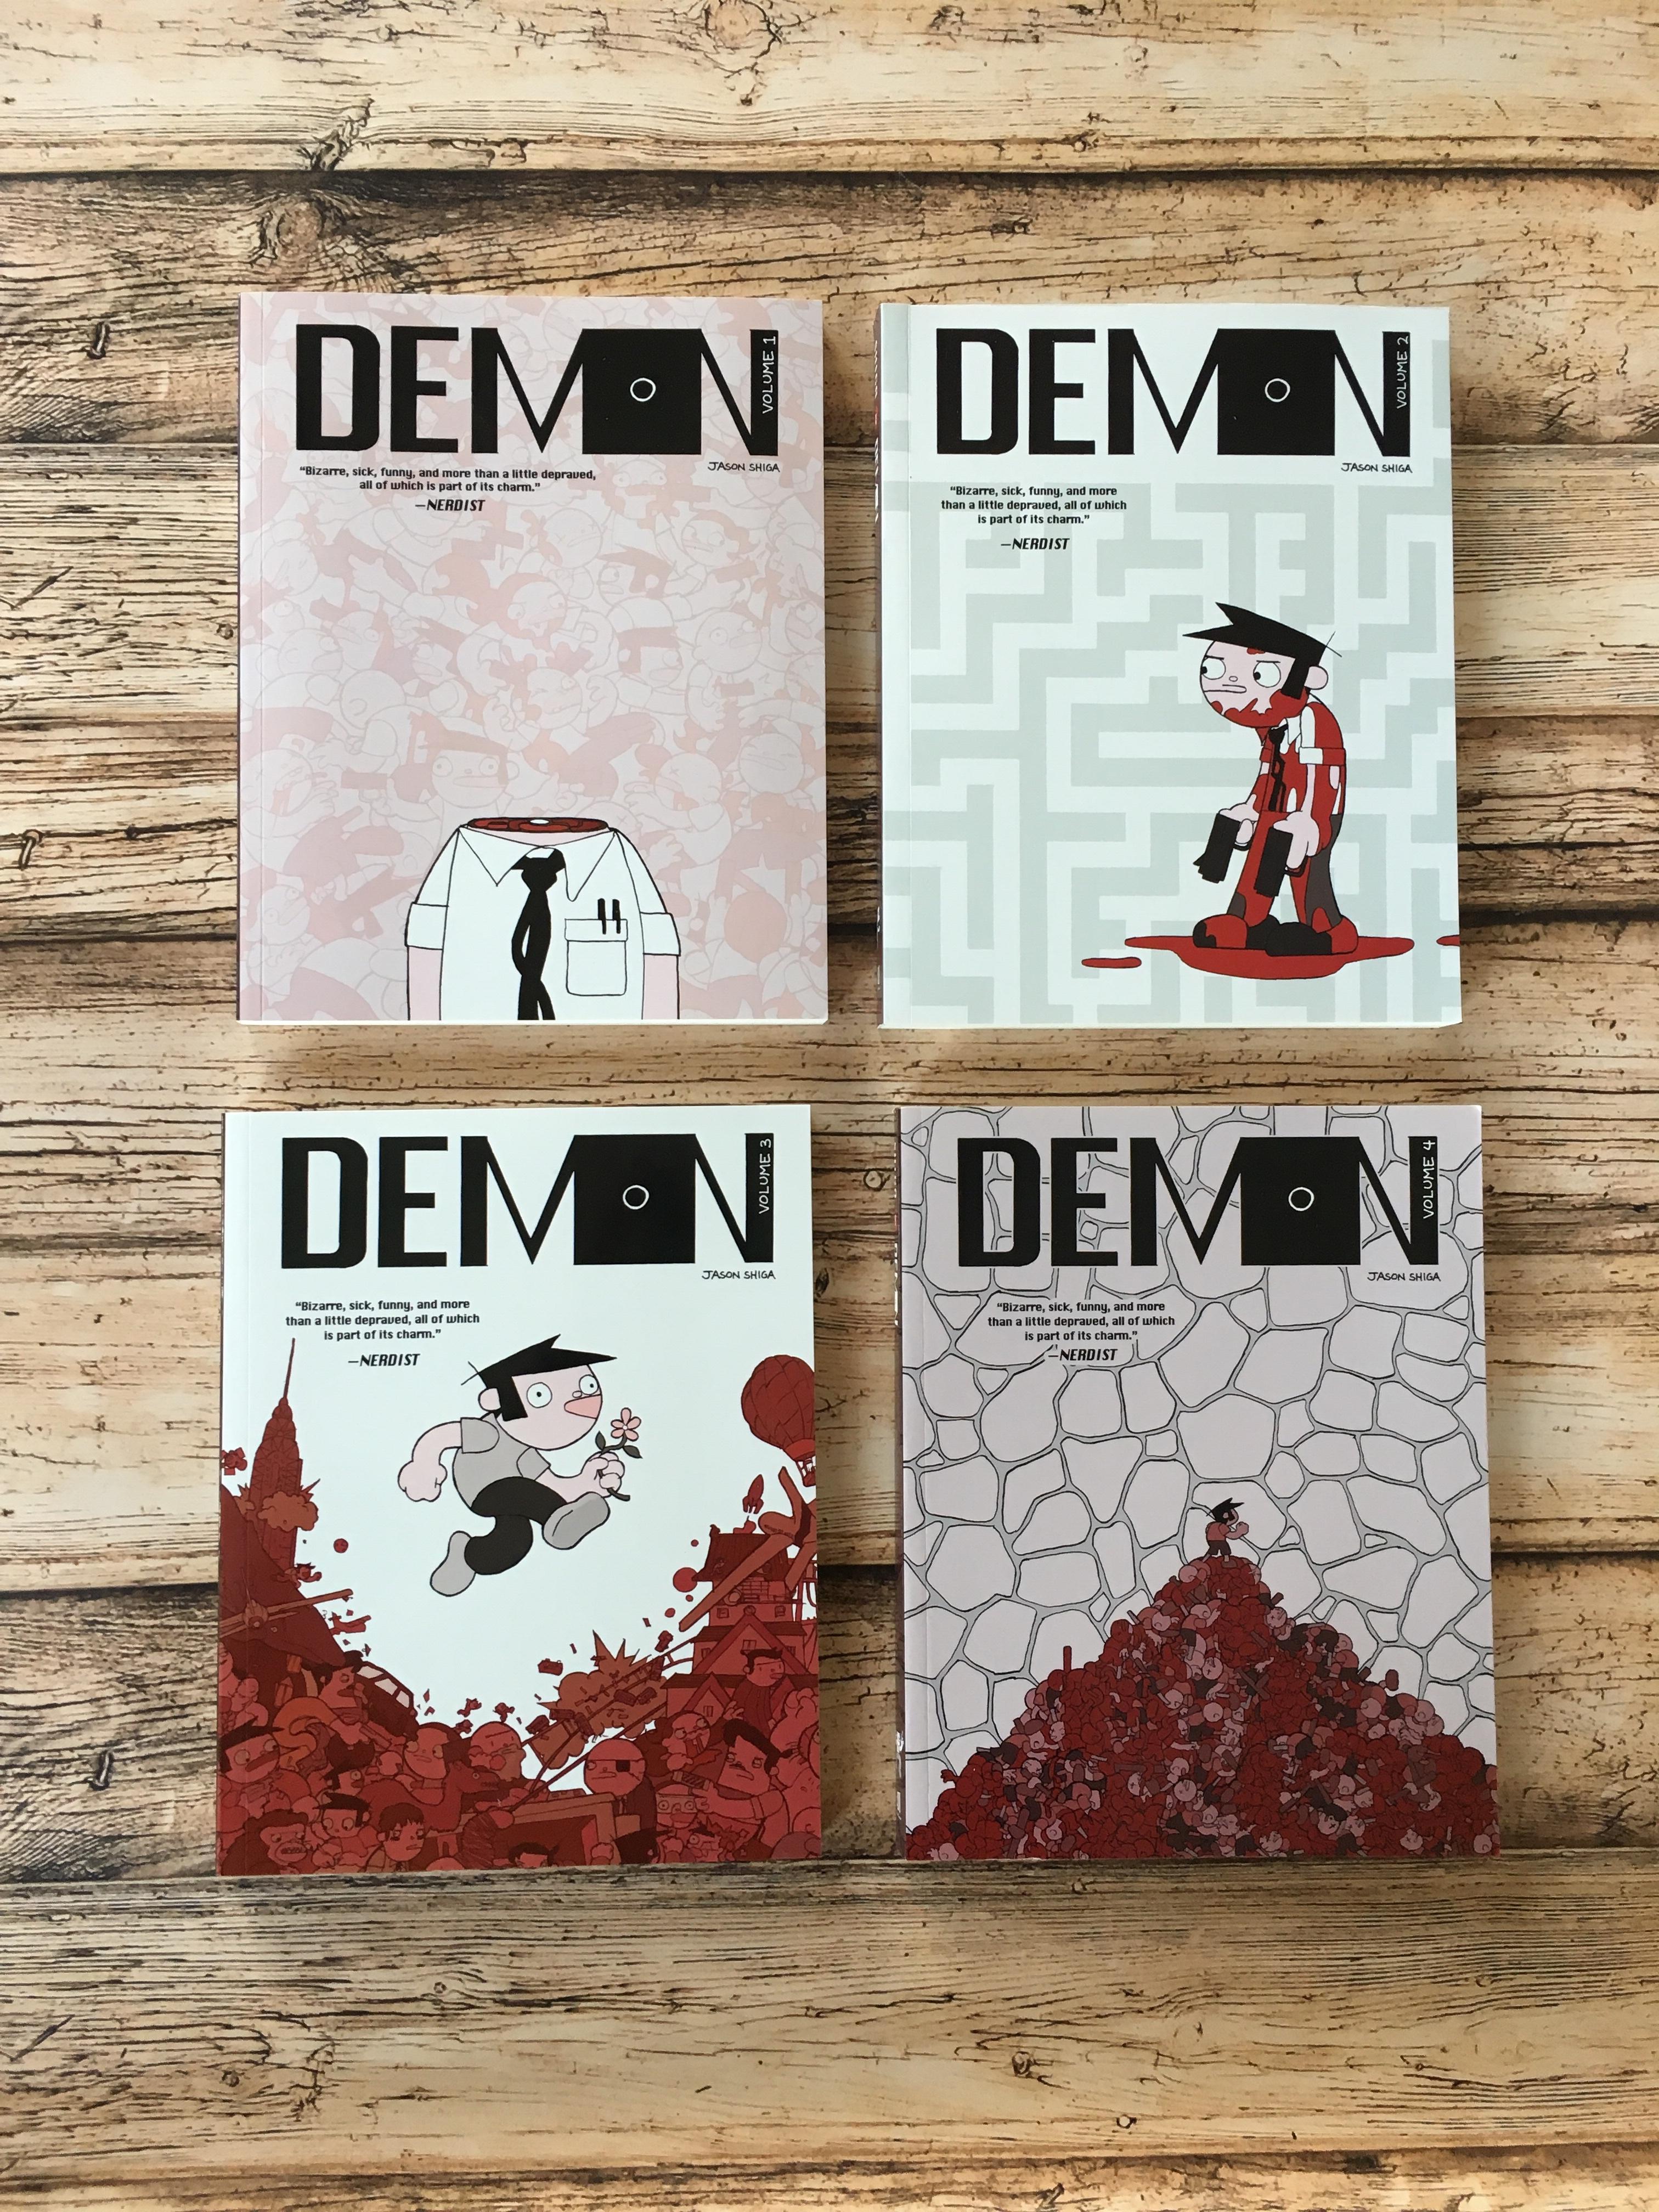 Demons 2 1986 online dating